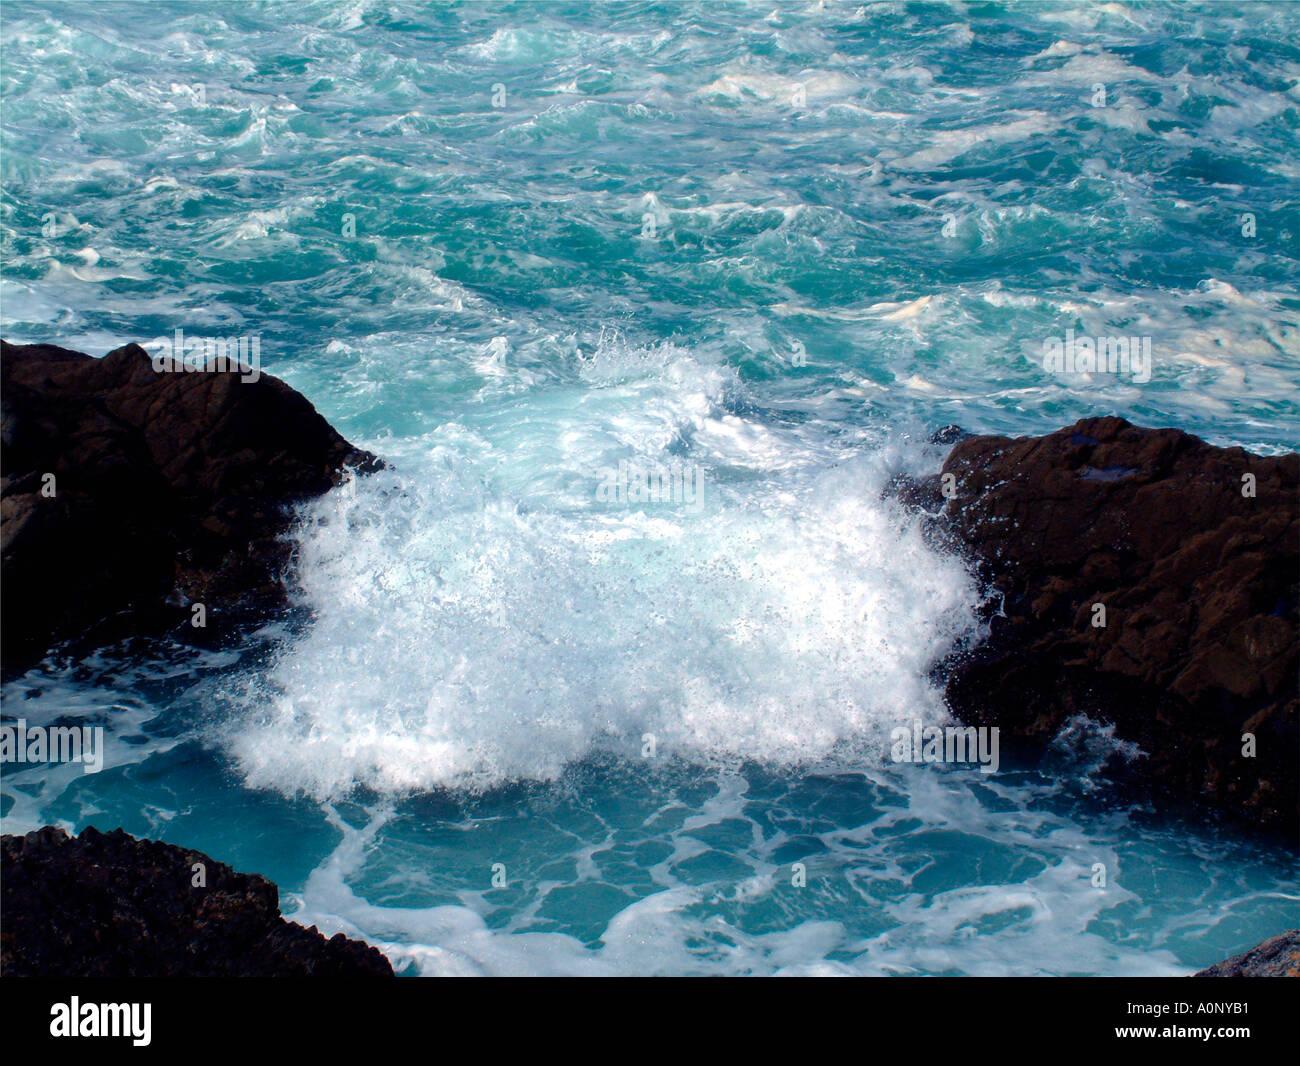 Splash Immagini Stock